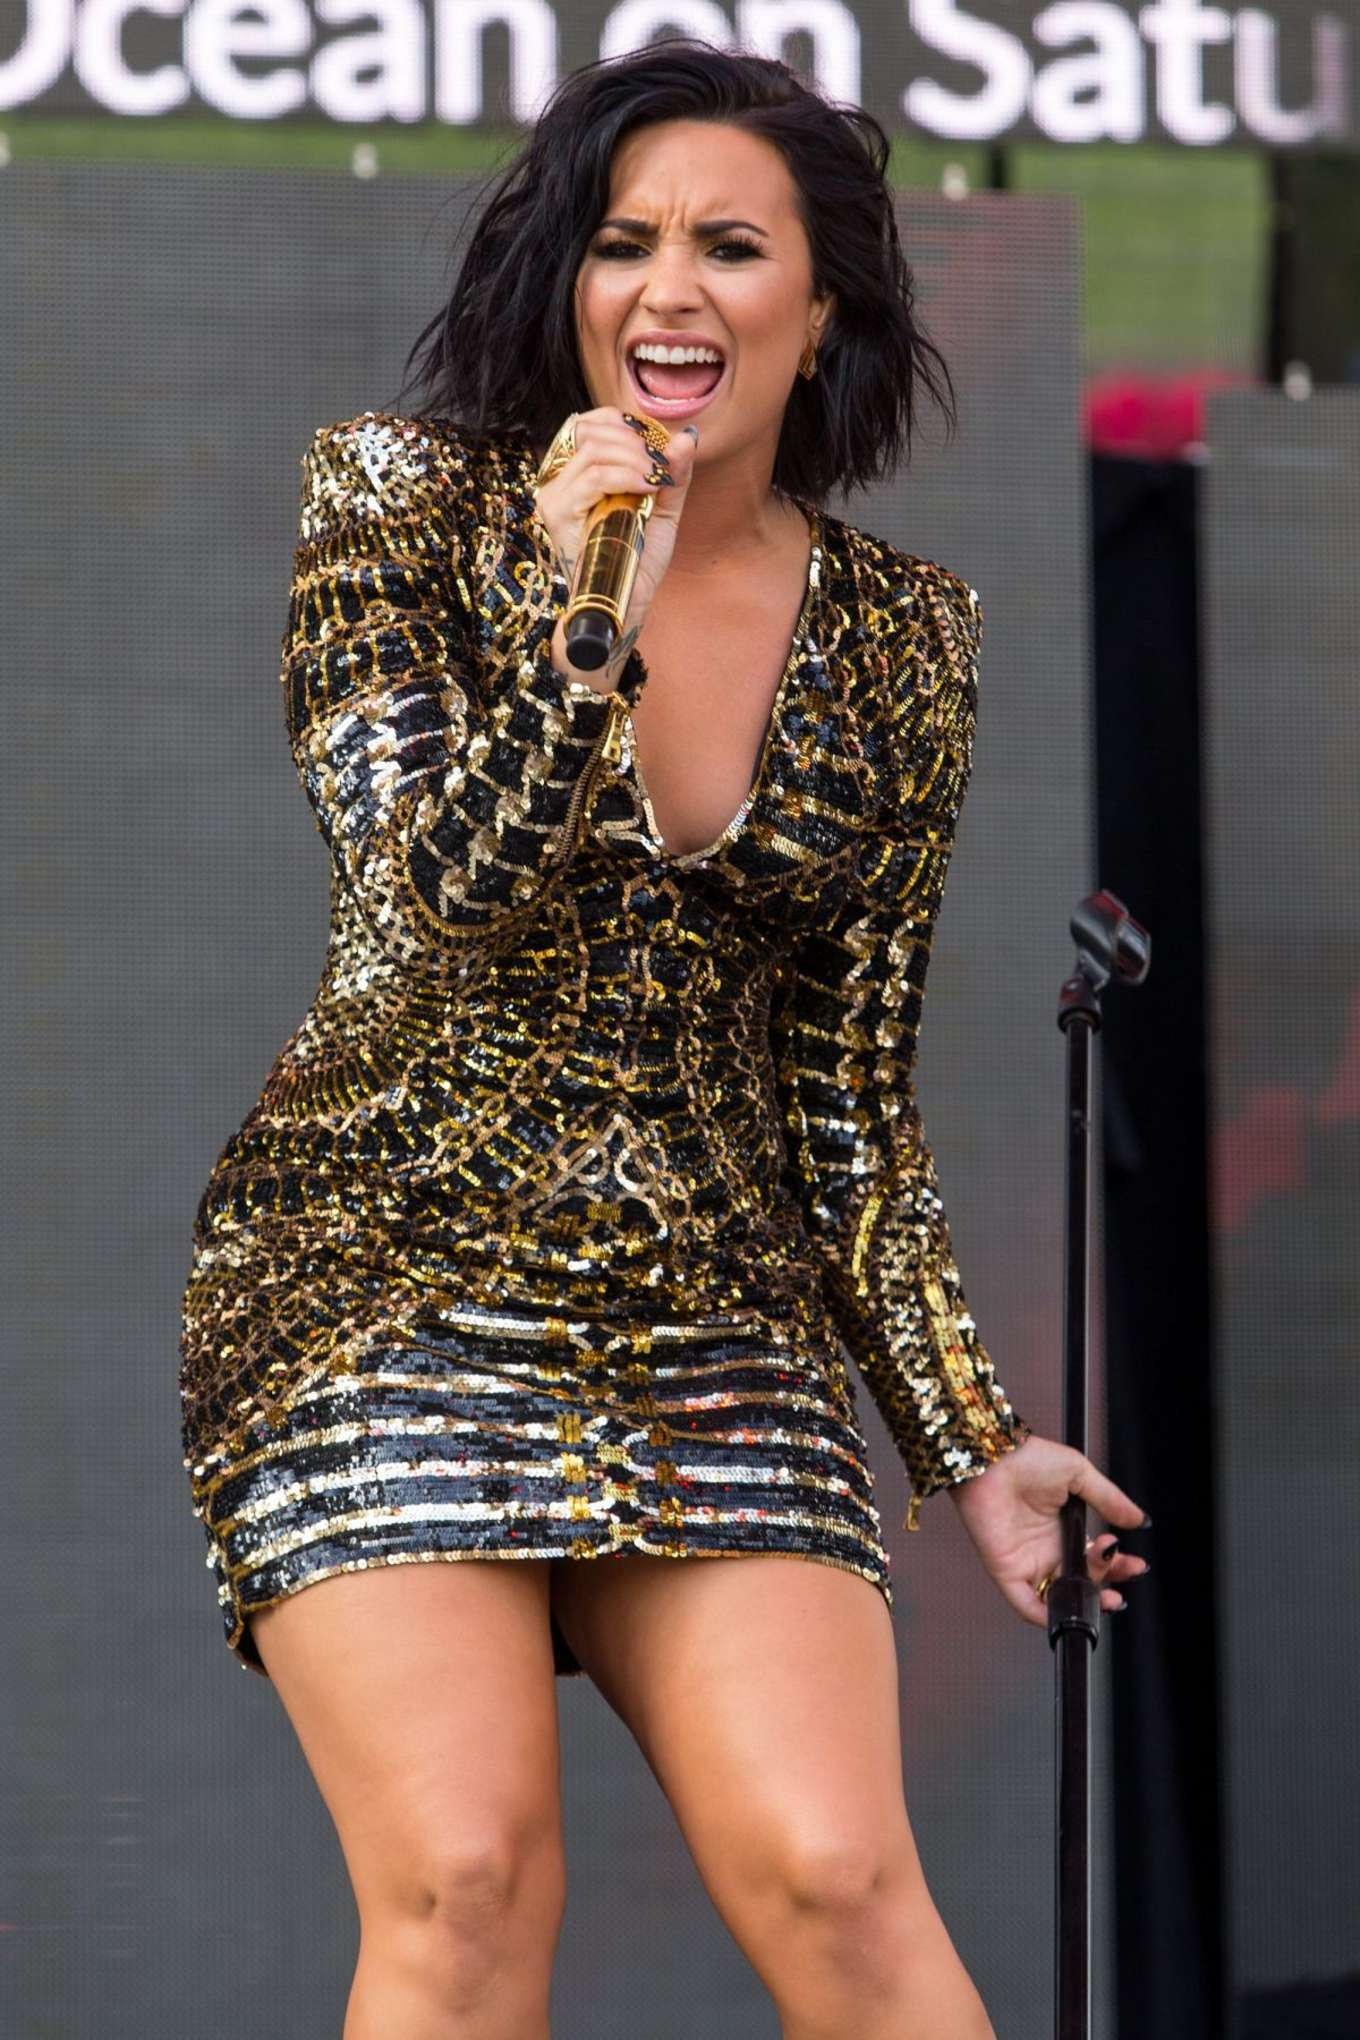 Demi Lovato Performs At Wango Tango 2016 In Los Angeles